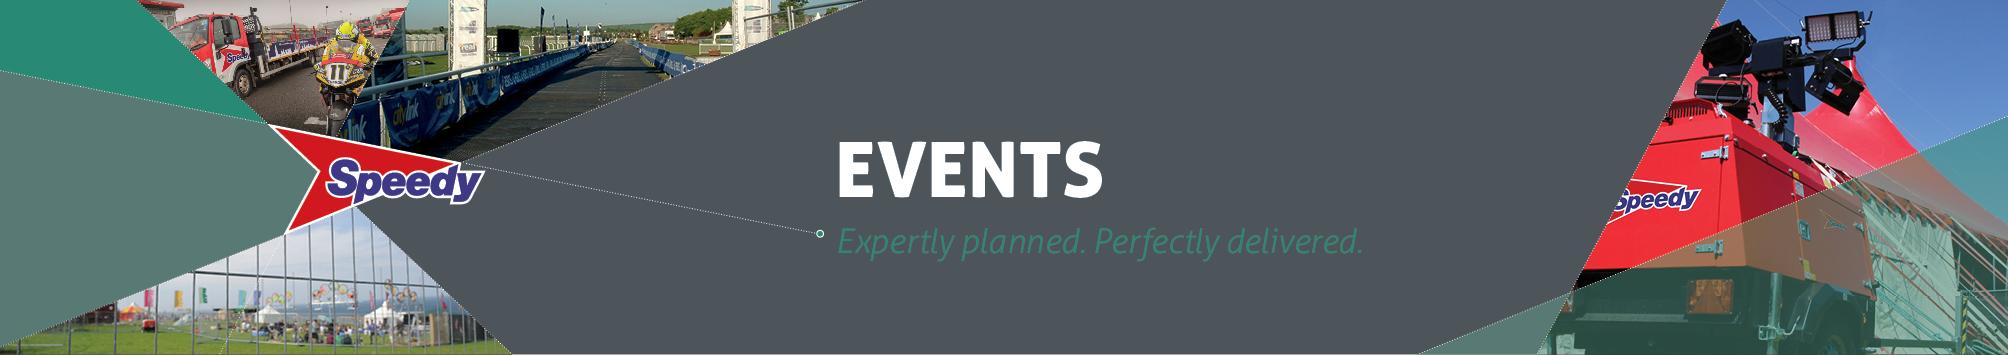 Events Landing Page Header.jpg